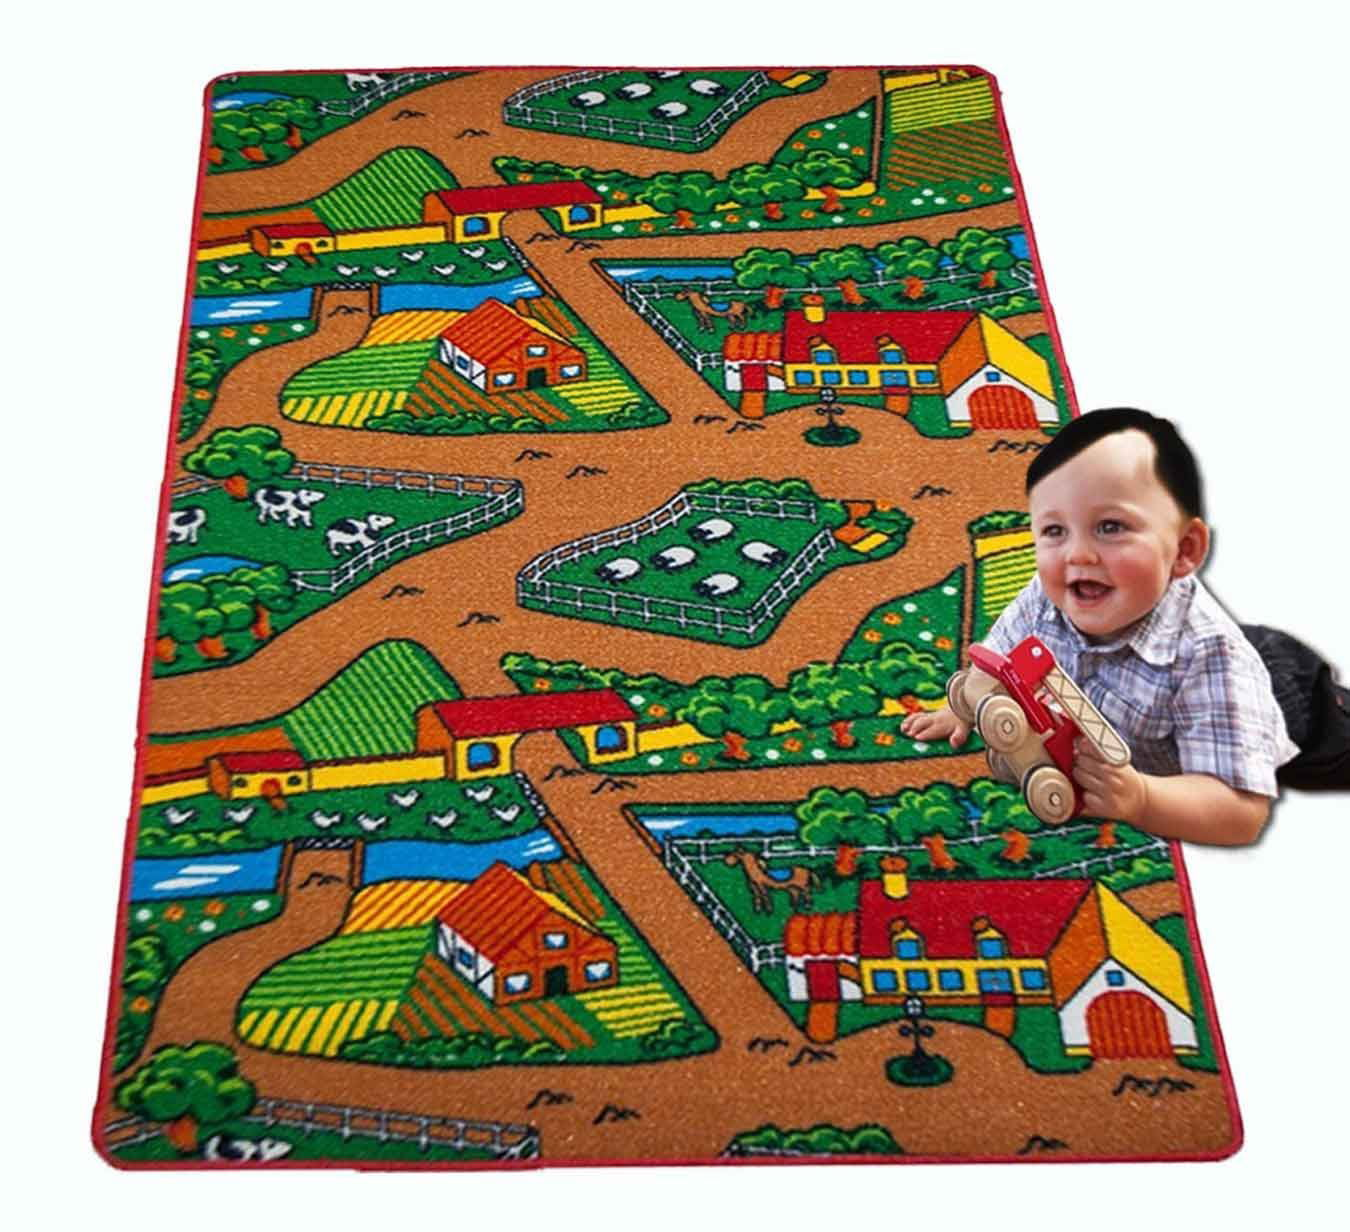 Non Skid Gel Backing Mybecca Kids Rug Basketball Ground 5 x 7 Children Area Rug for Playroom /& Nursery 59 x 82